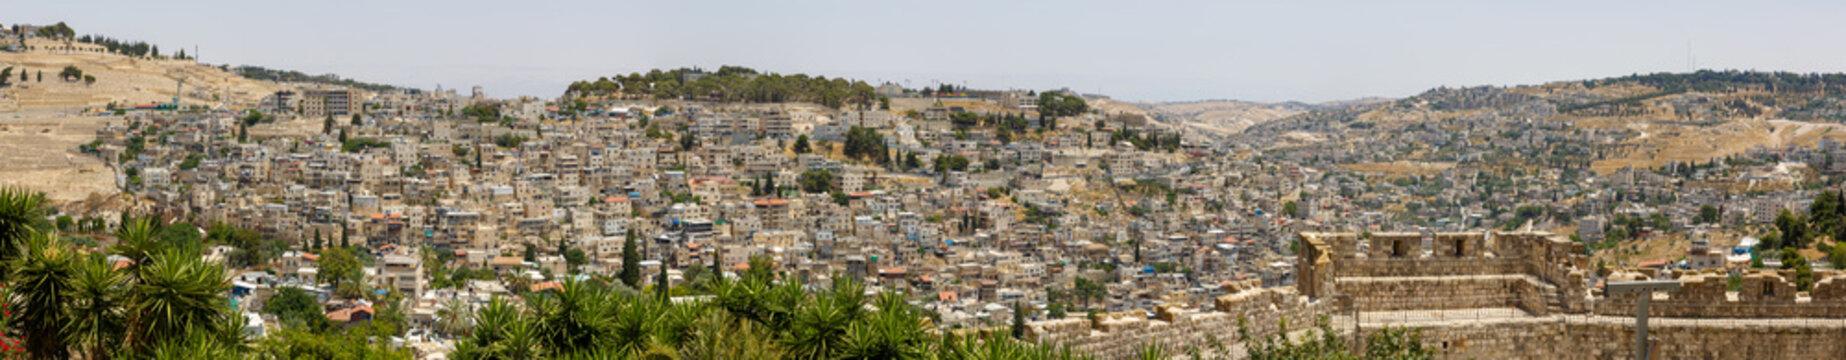 Wide panorama of buildings in East Jerusalem